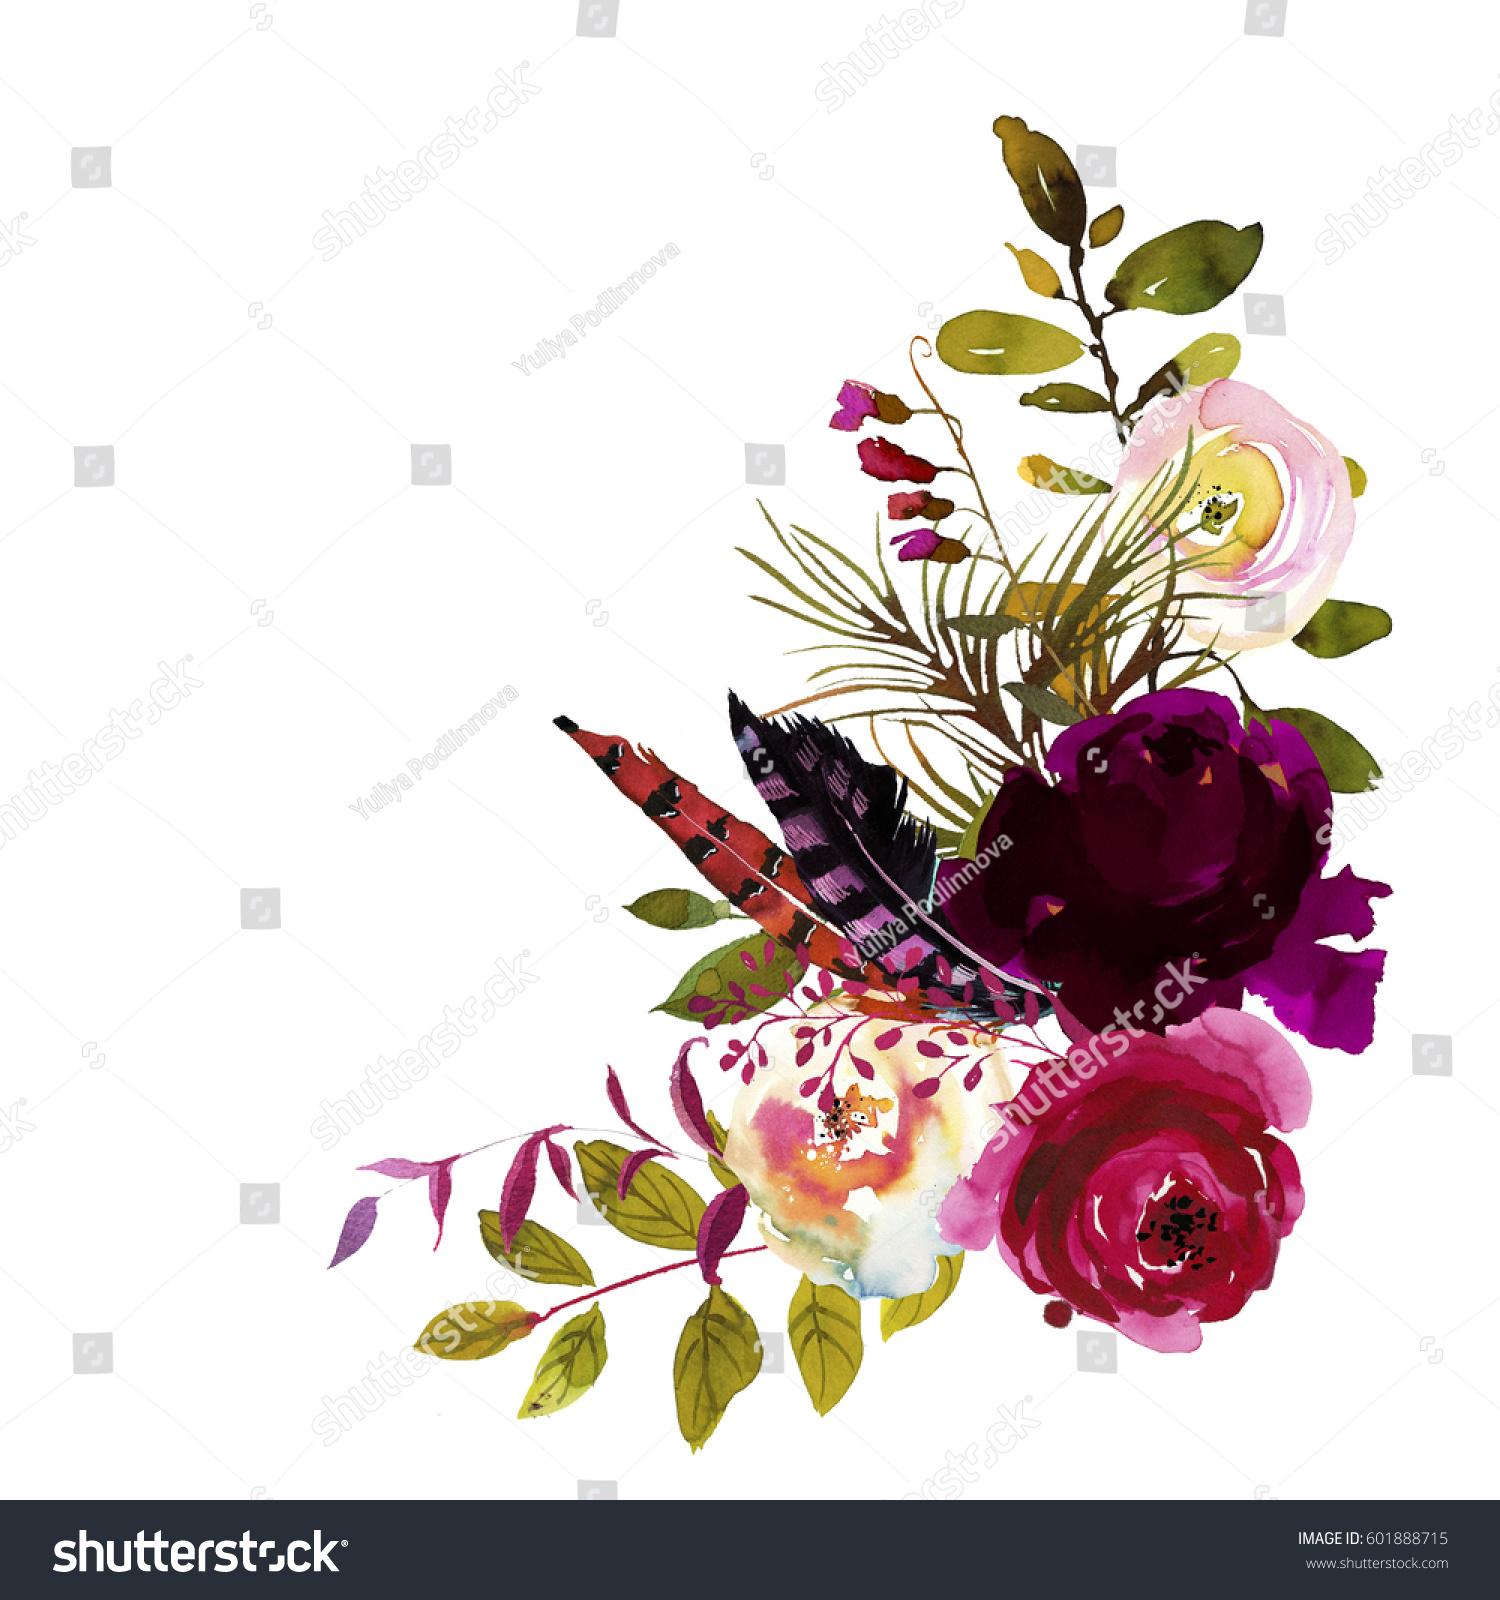 Watercolor Boho Burgundy Magenta White Floral Stock Illustration 601888715